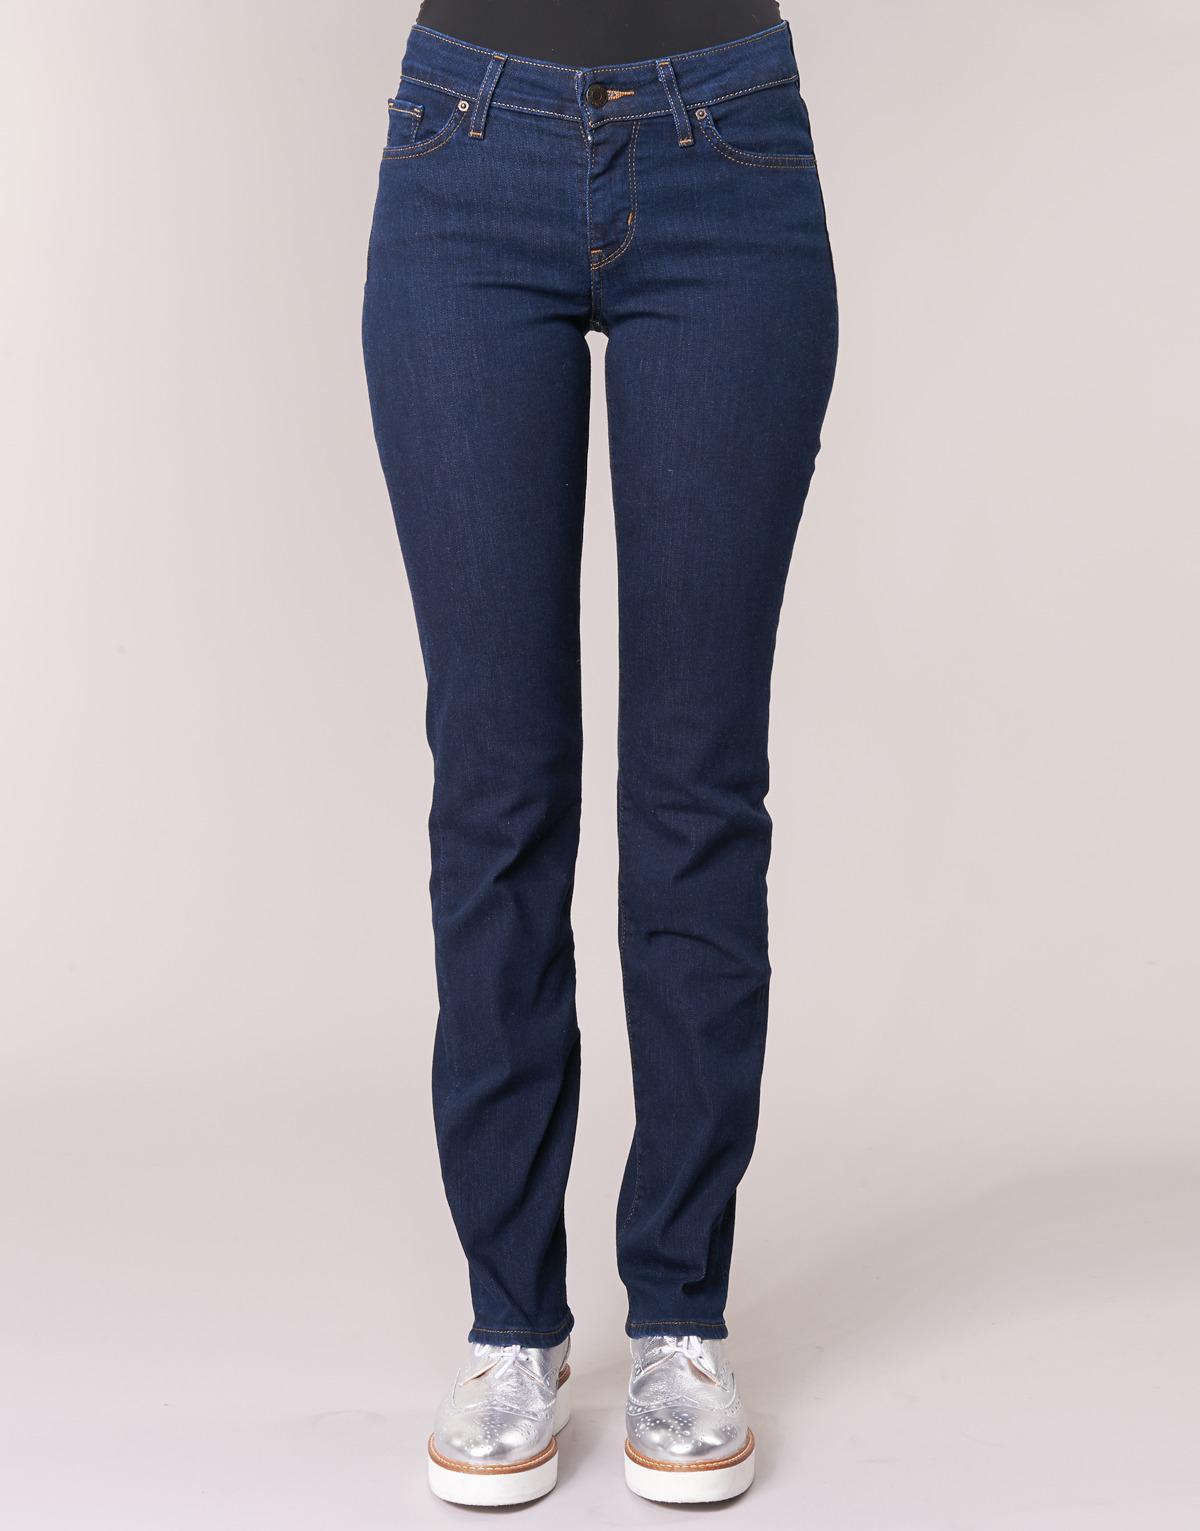 Levi's Denim Levis 714 Straight Women's Jeans In Blue